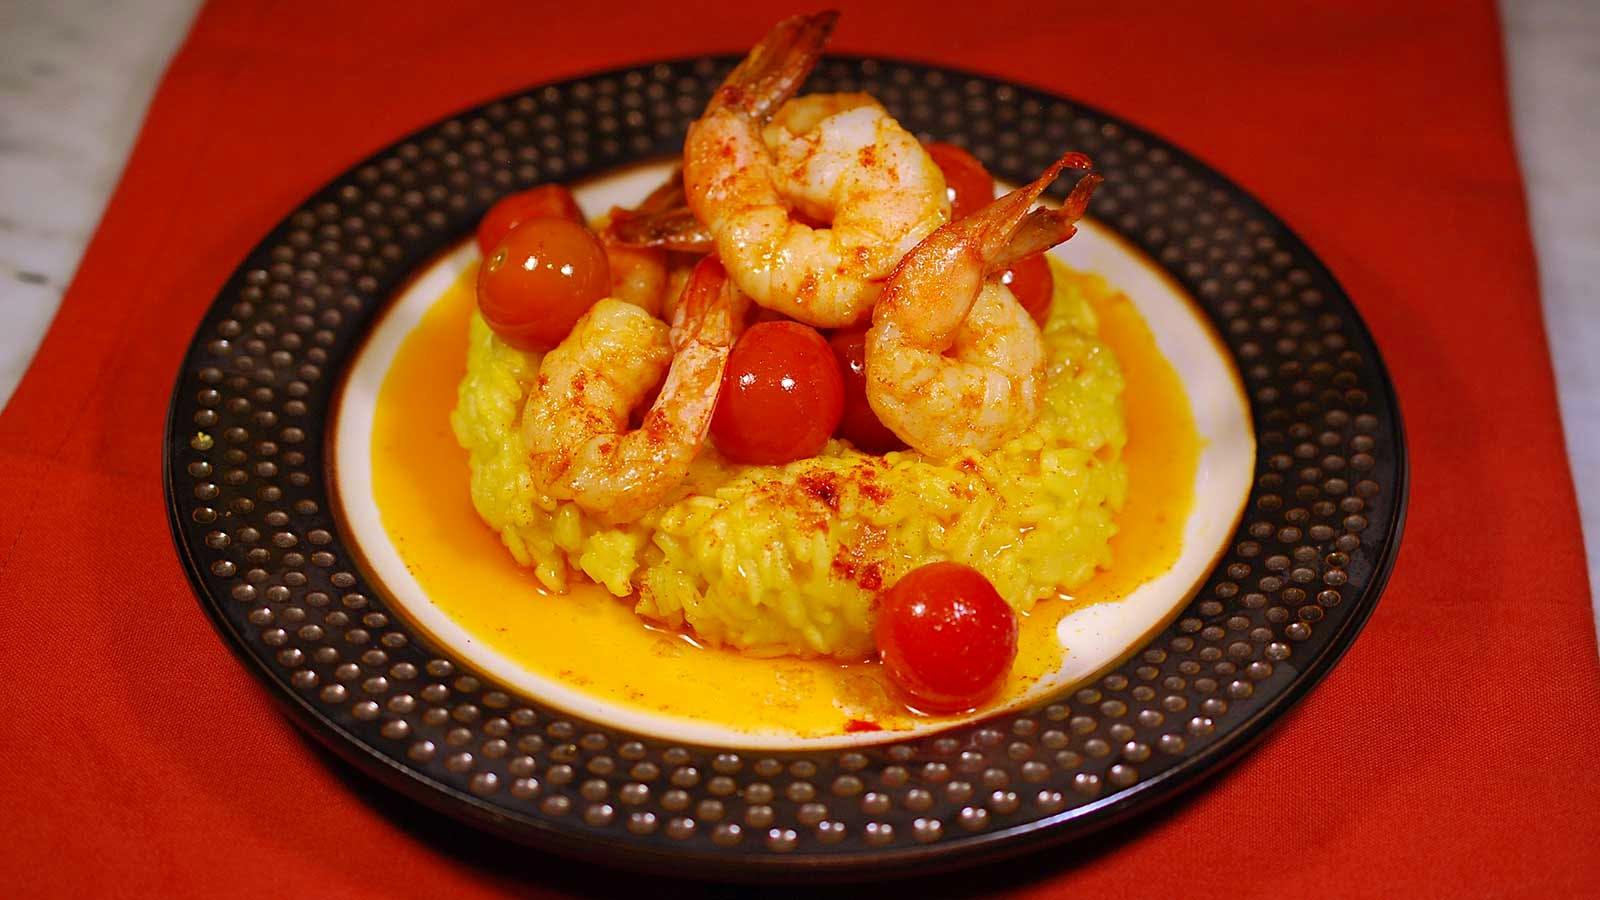 8 & $20: Smoky Paprika Shrimp With Saffron-Lemon Pilaf